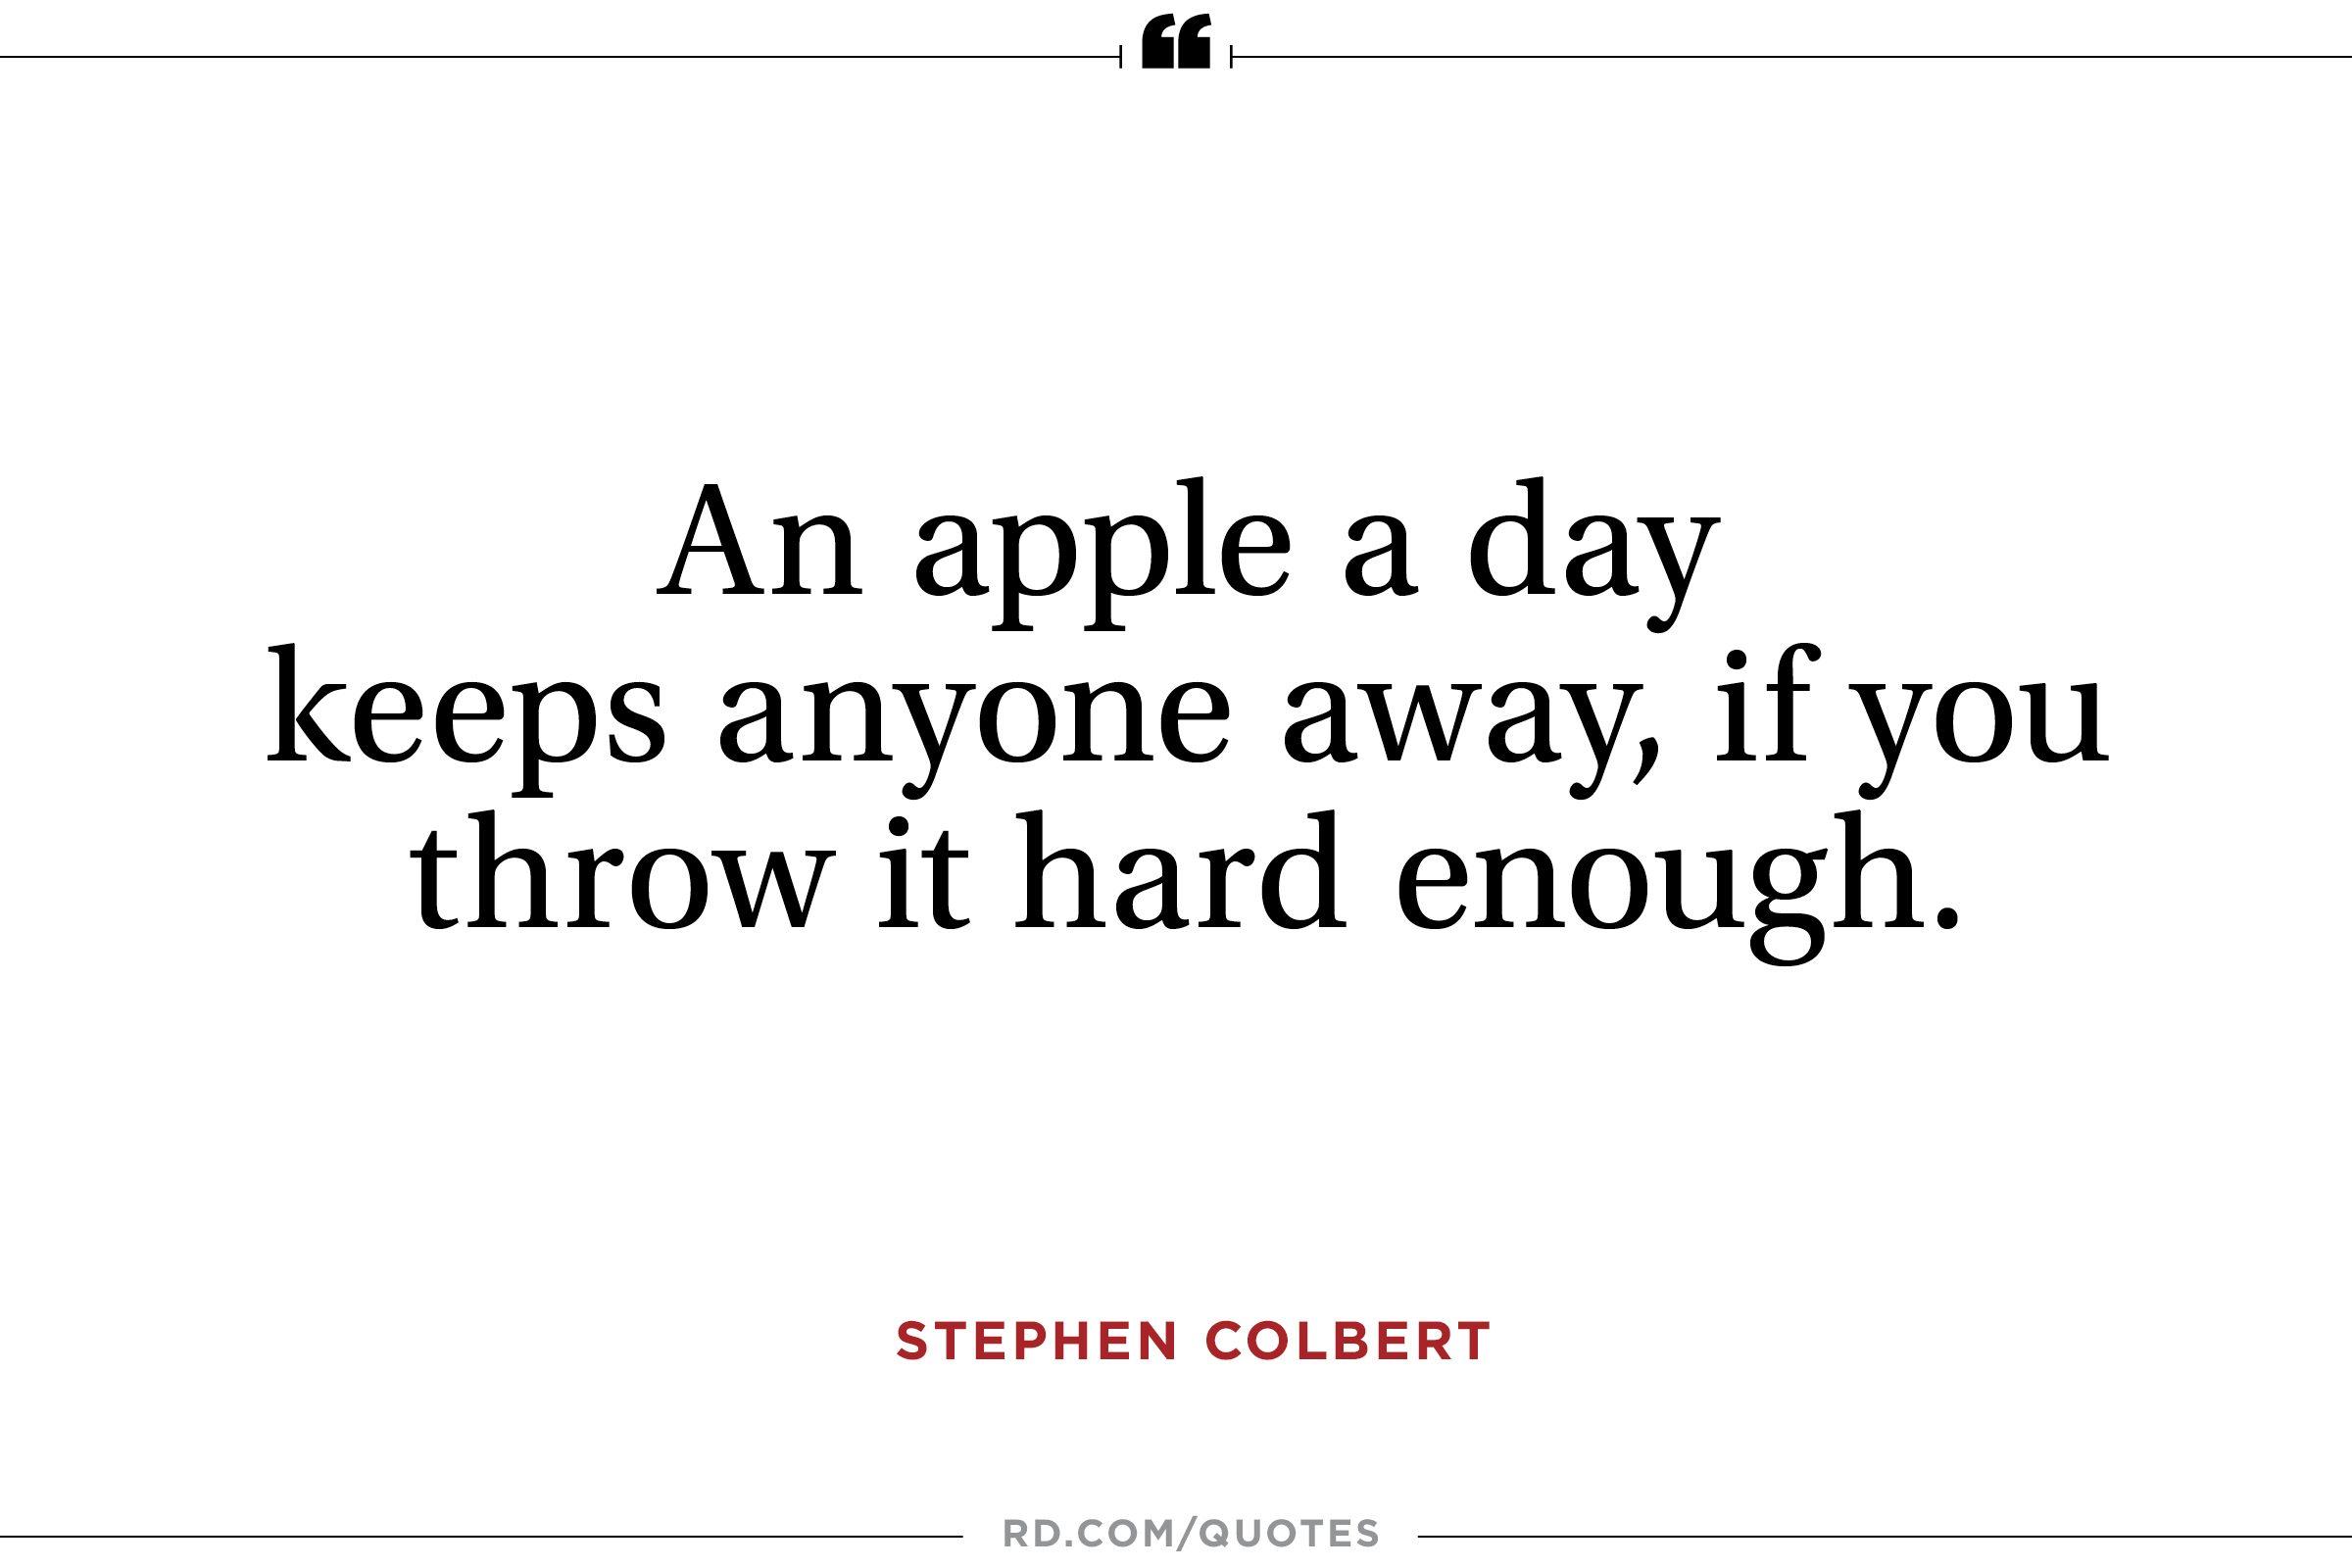 14 Best Ever Stephen Colbert Quotes Readers Digest